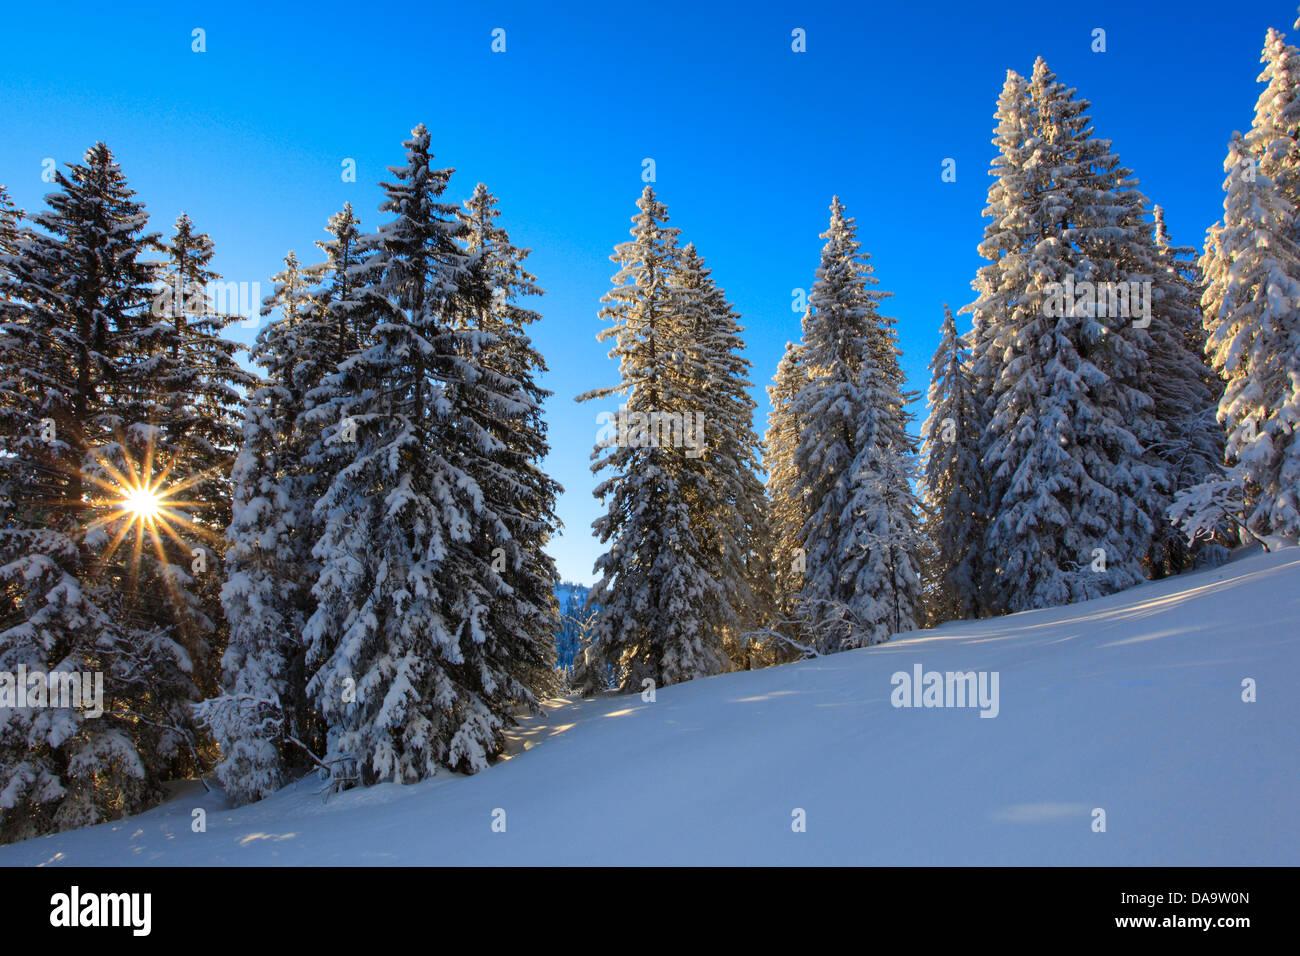 Alps, tree, trees, spruce, spruces, back light, sky, cold, morning, morning light, snow, Switzerland, Europe, sun, - Stock Image